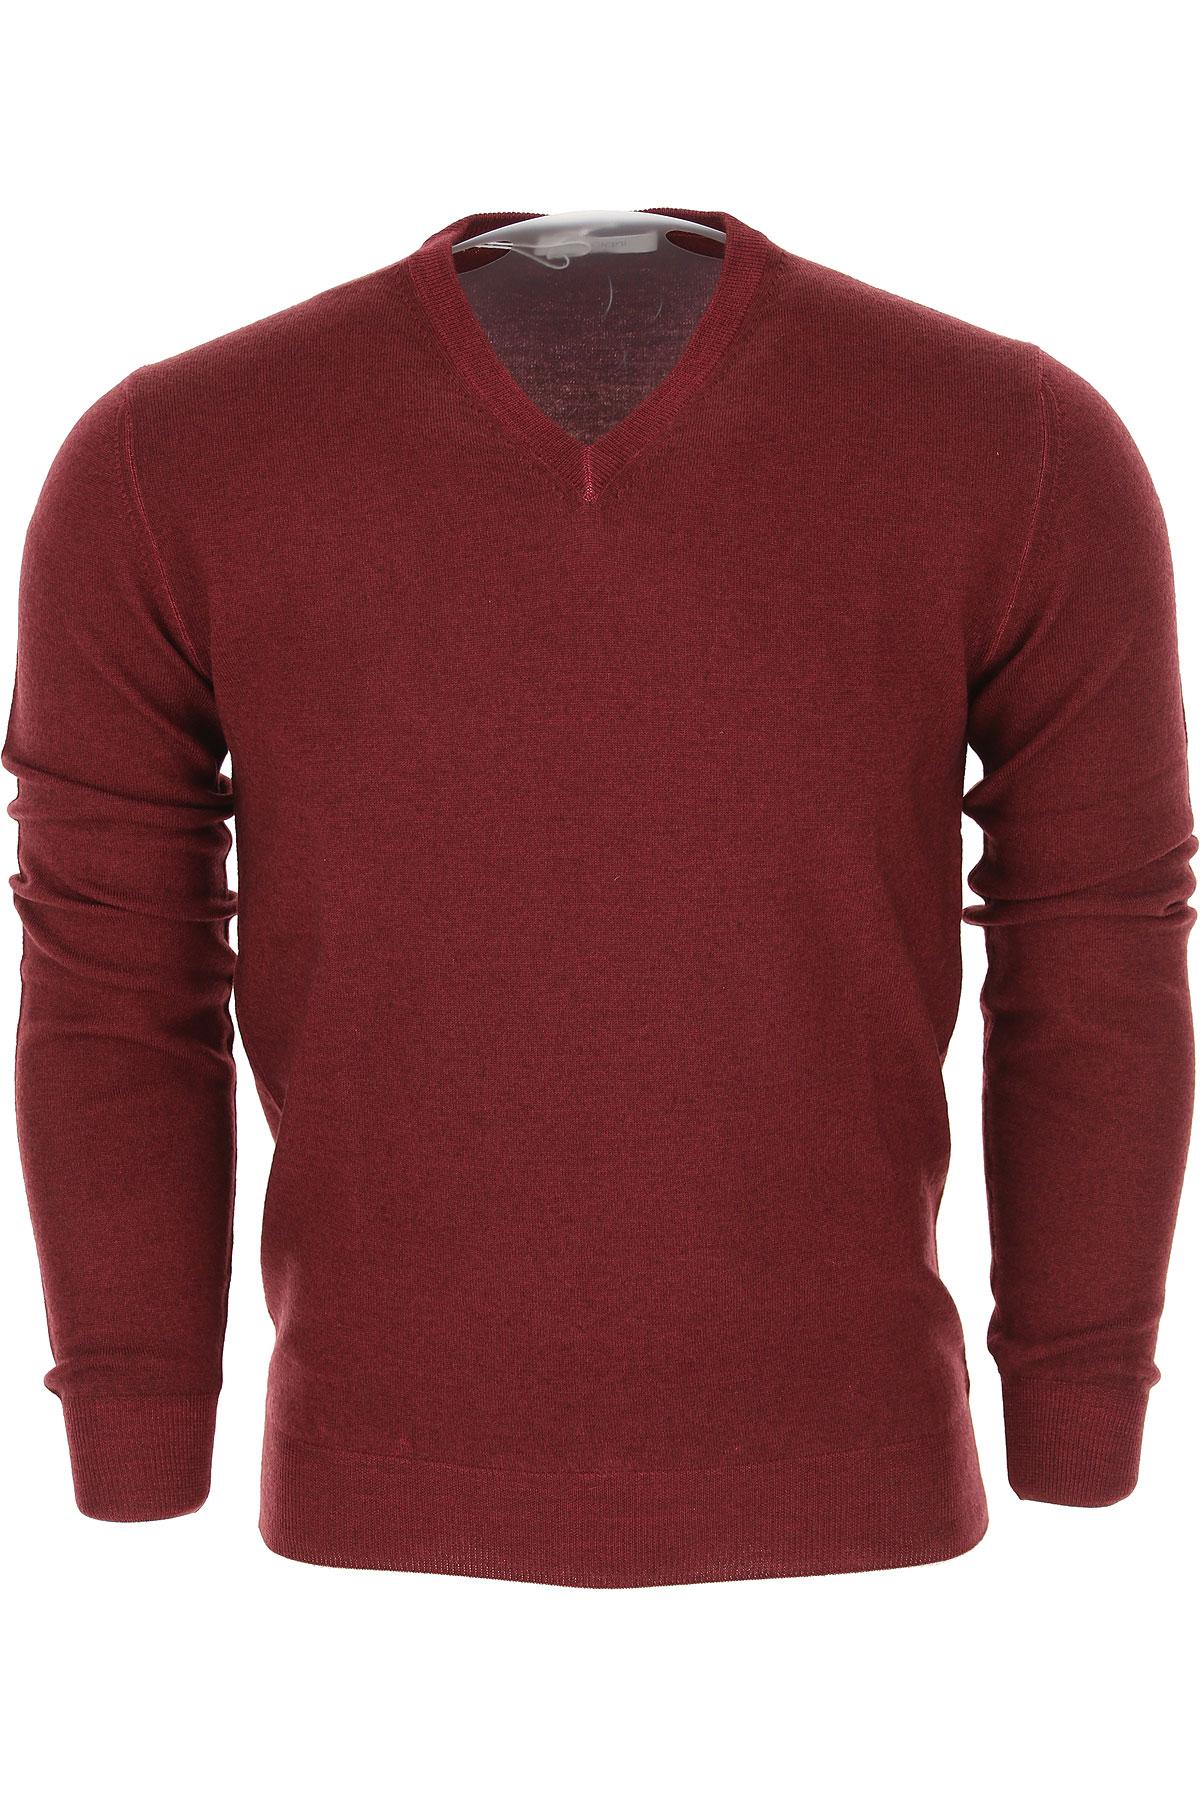 Image of Cruciani Sweater for Men Jumper, Bordeaux, Wool, 2017, L M S XL